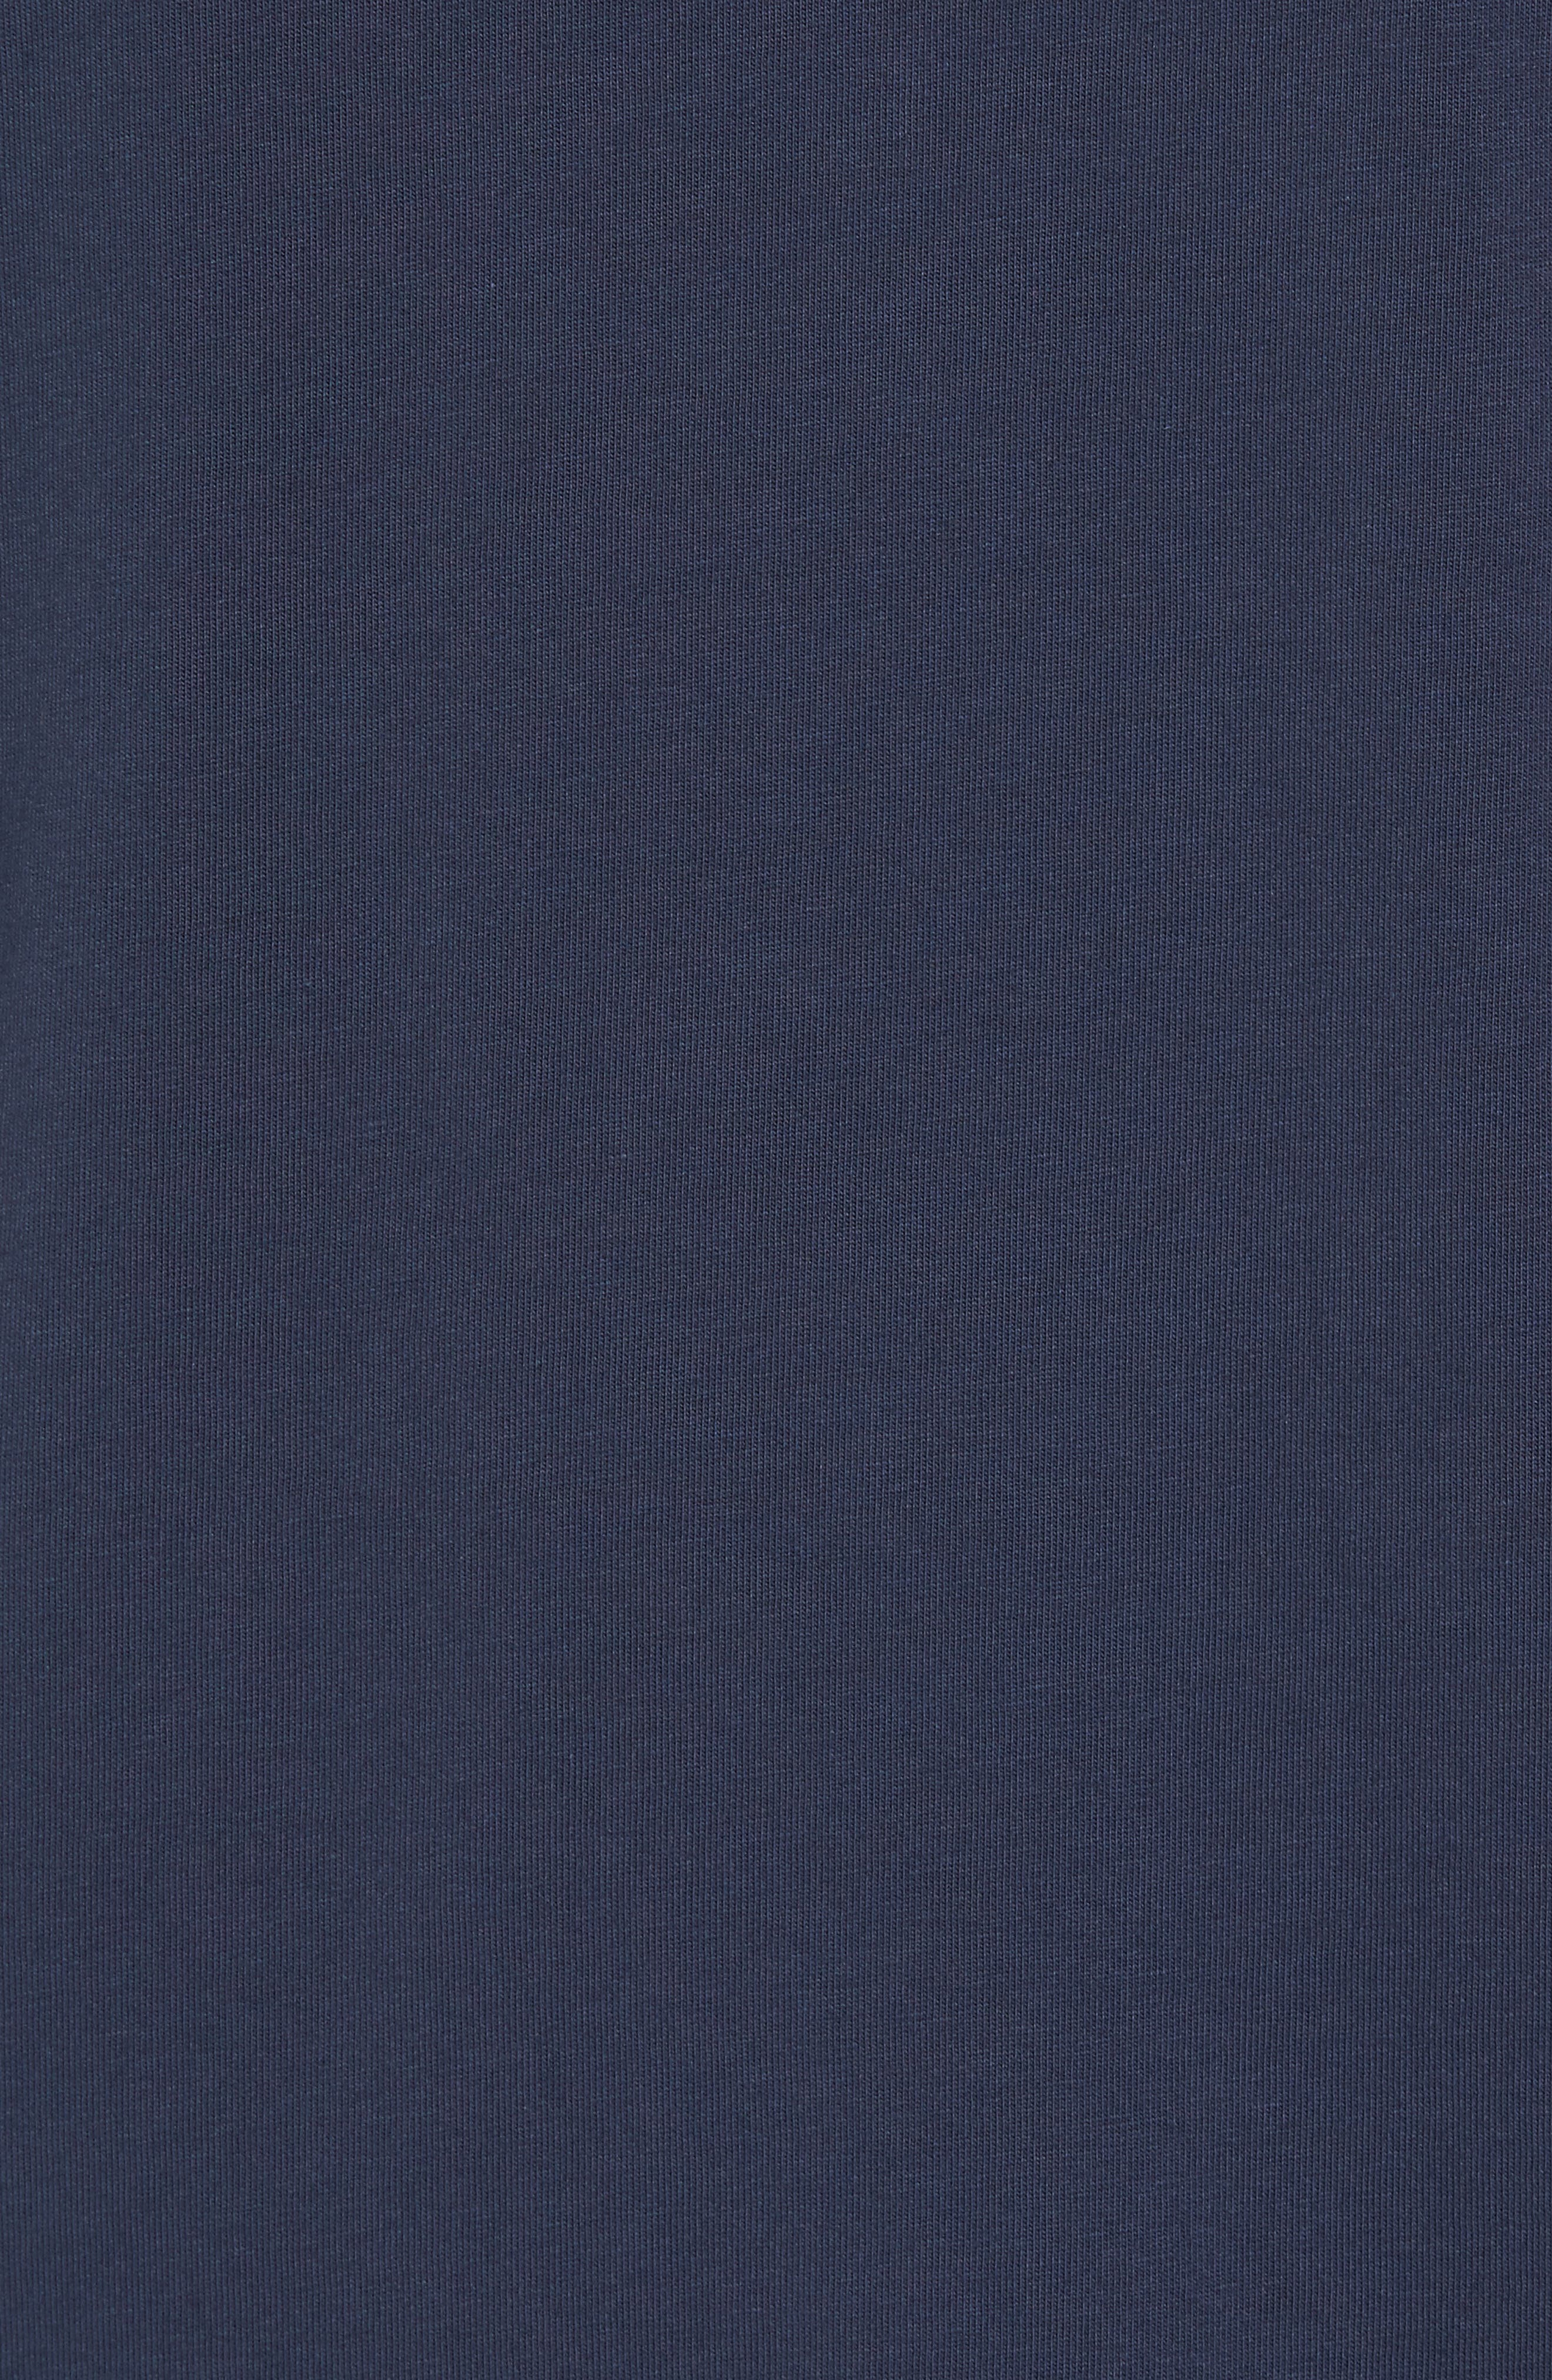 Alternate Image 5  - vineyard vines Mr. Claus Whale Graphic Pocket T-Shirt